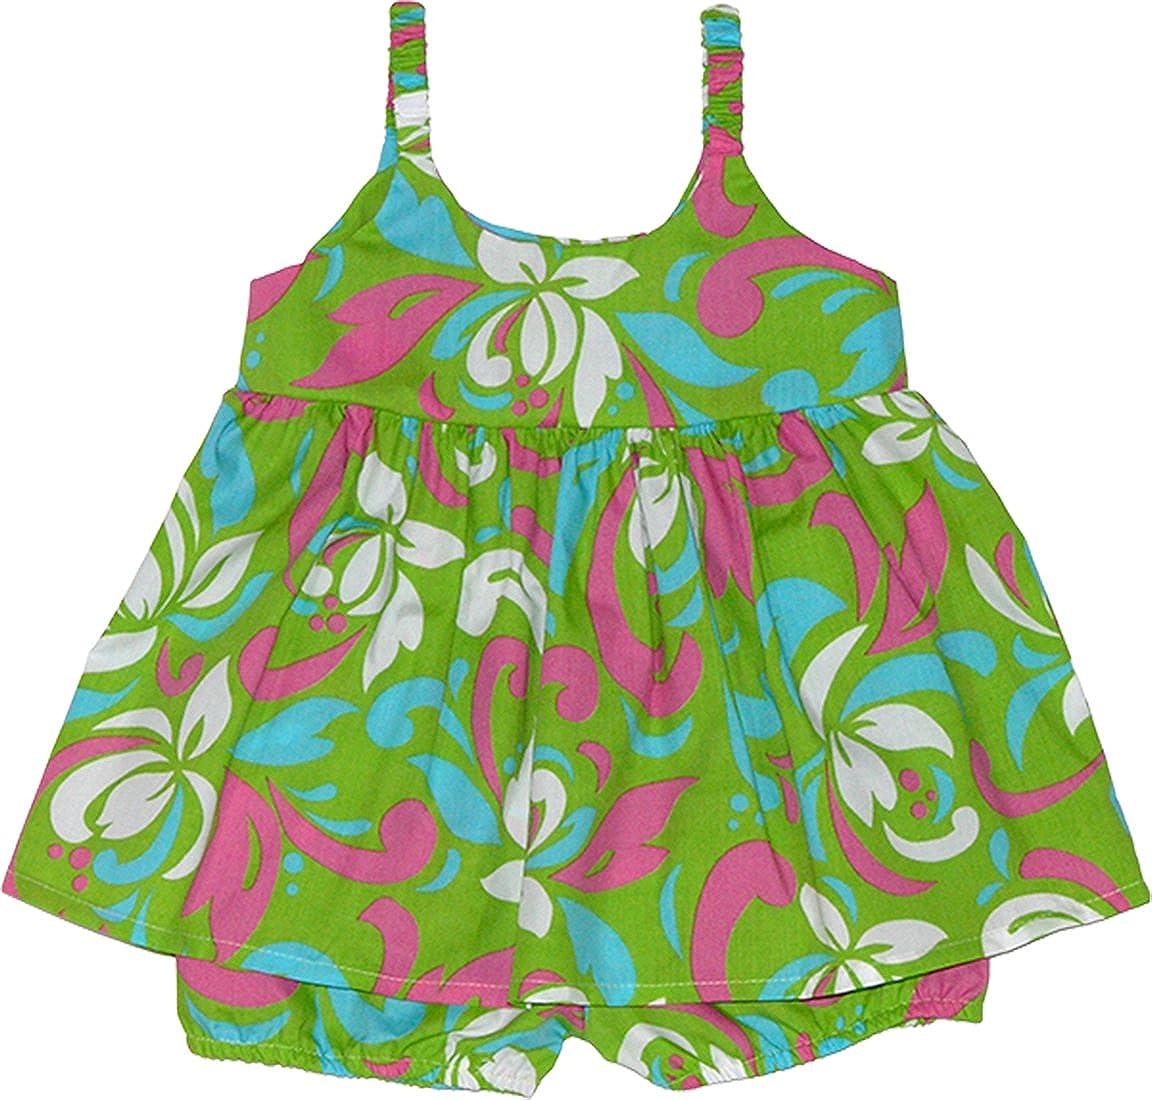 RJC Girls Bold Frolic Spree Bungee Dress